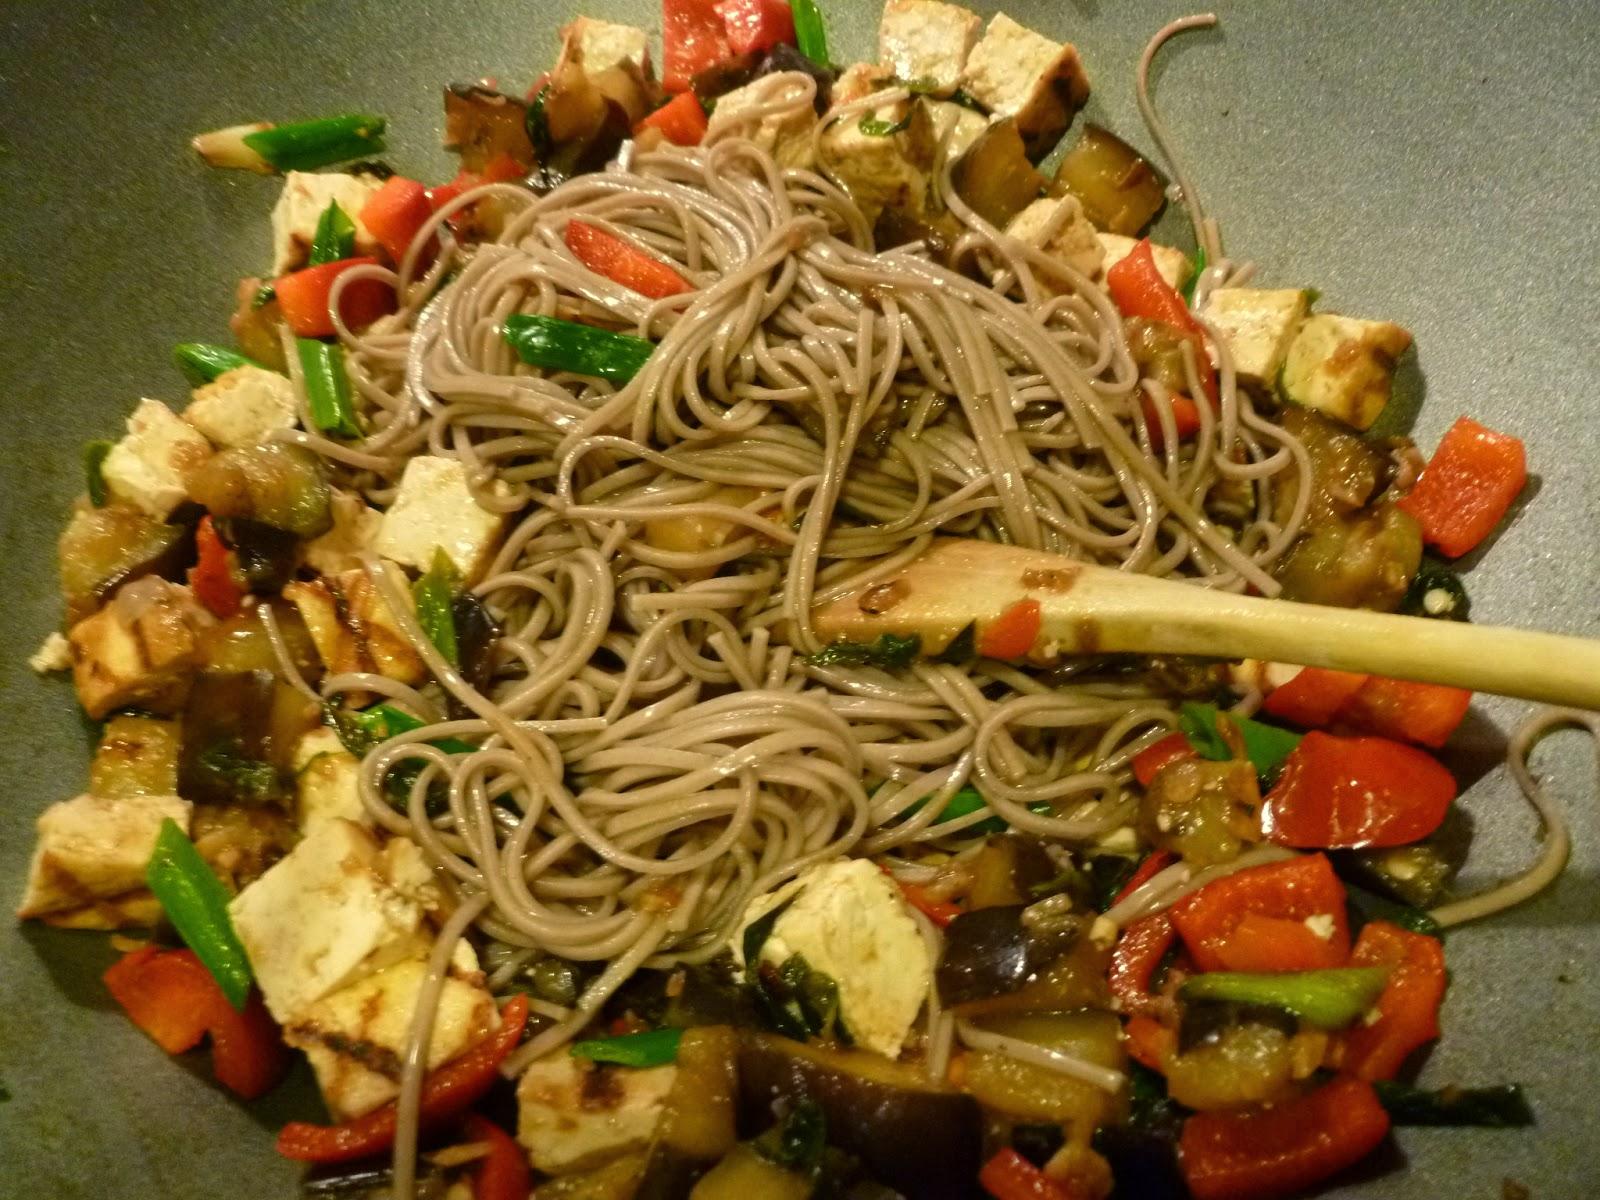 Enjoy Indian Food: Eggplant Tofu Soba Noodles